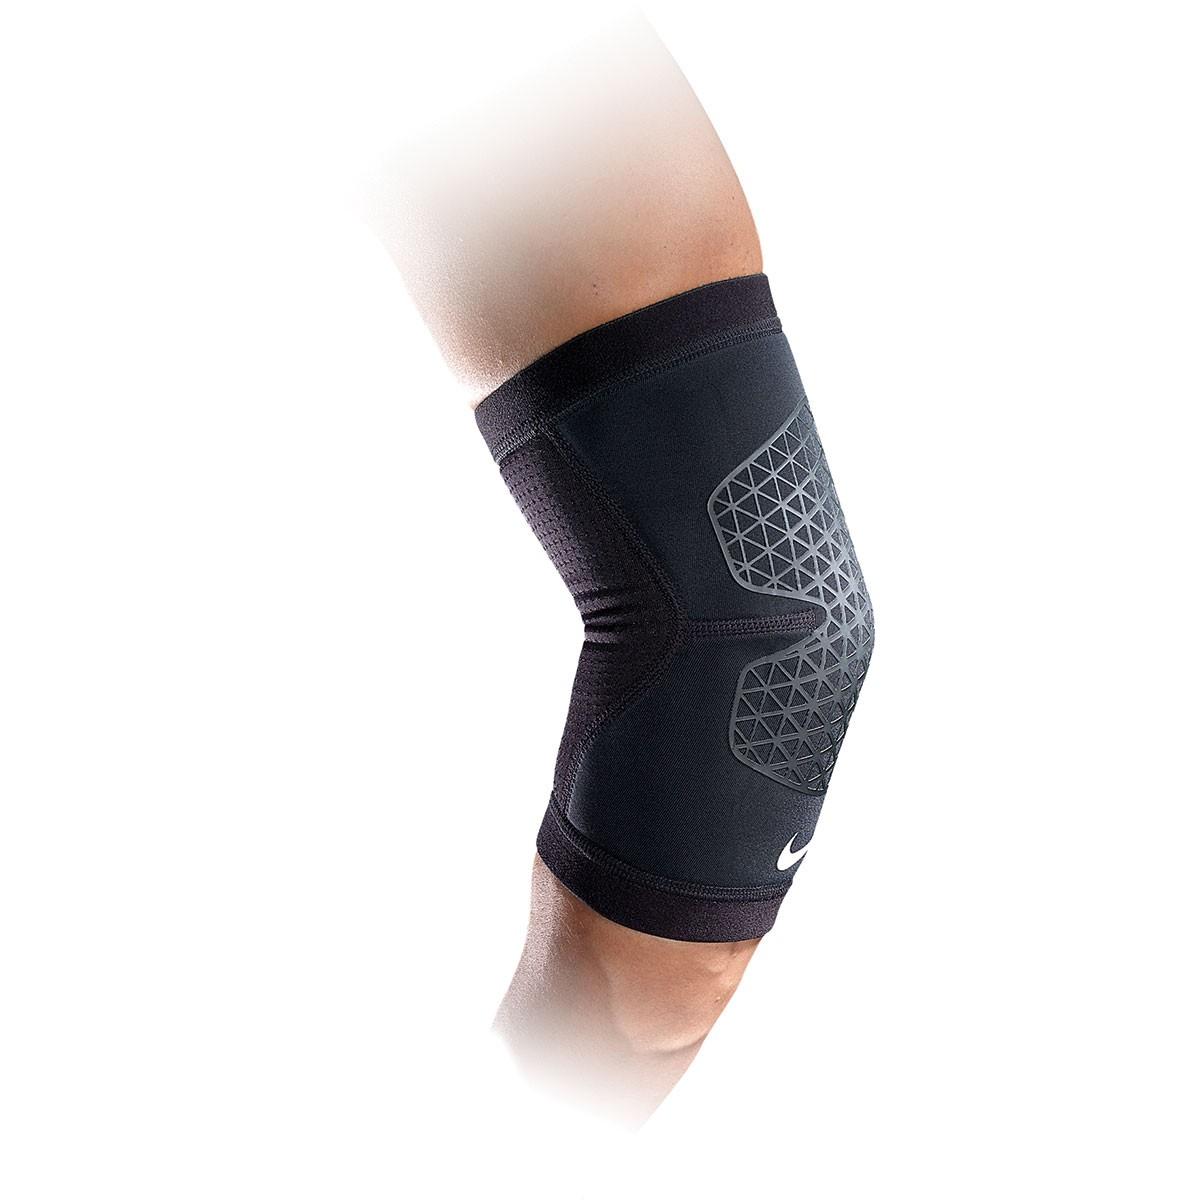 Nike Pro Combat Knee Sleeve - John Buckley Sports